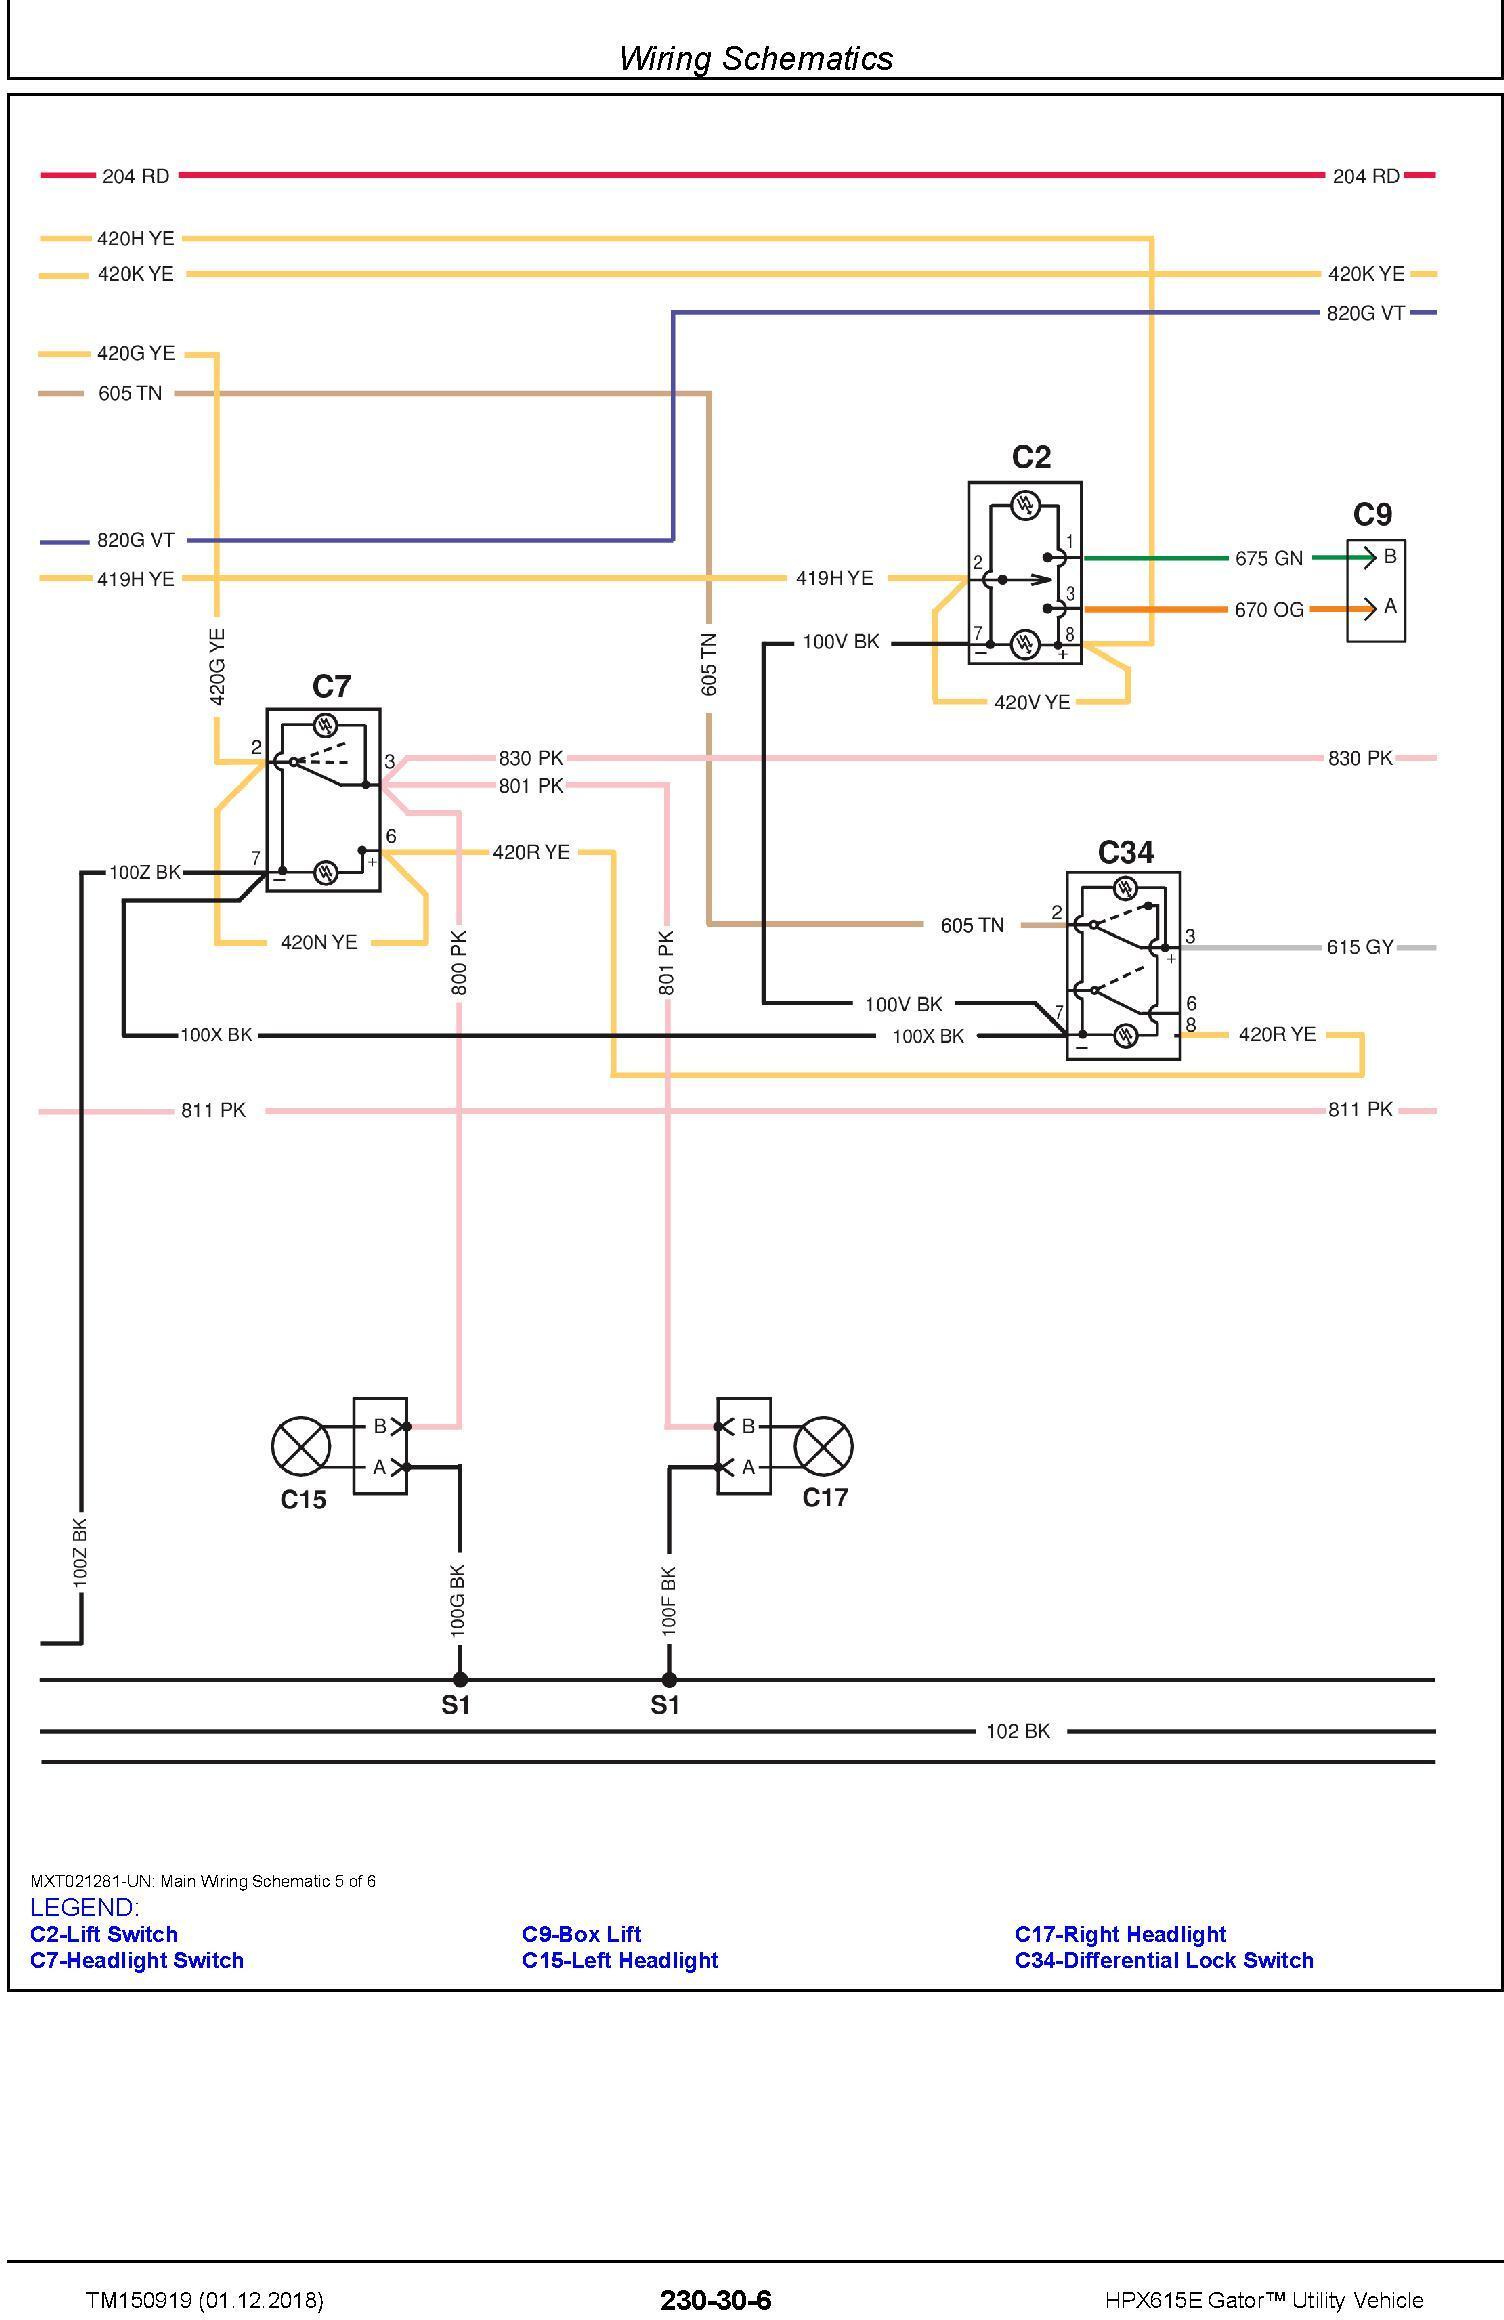 John Deere HPX615E Gator Utility Vehicle (SN. 010001-) Technical Manual (TM150919) - 3